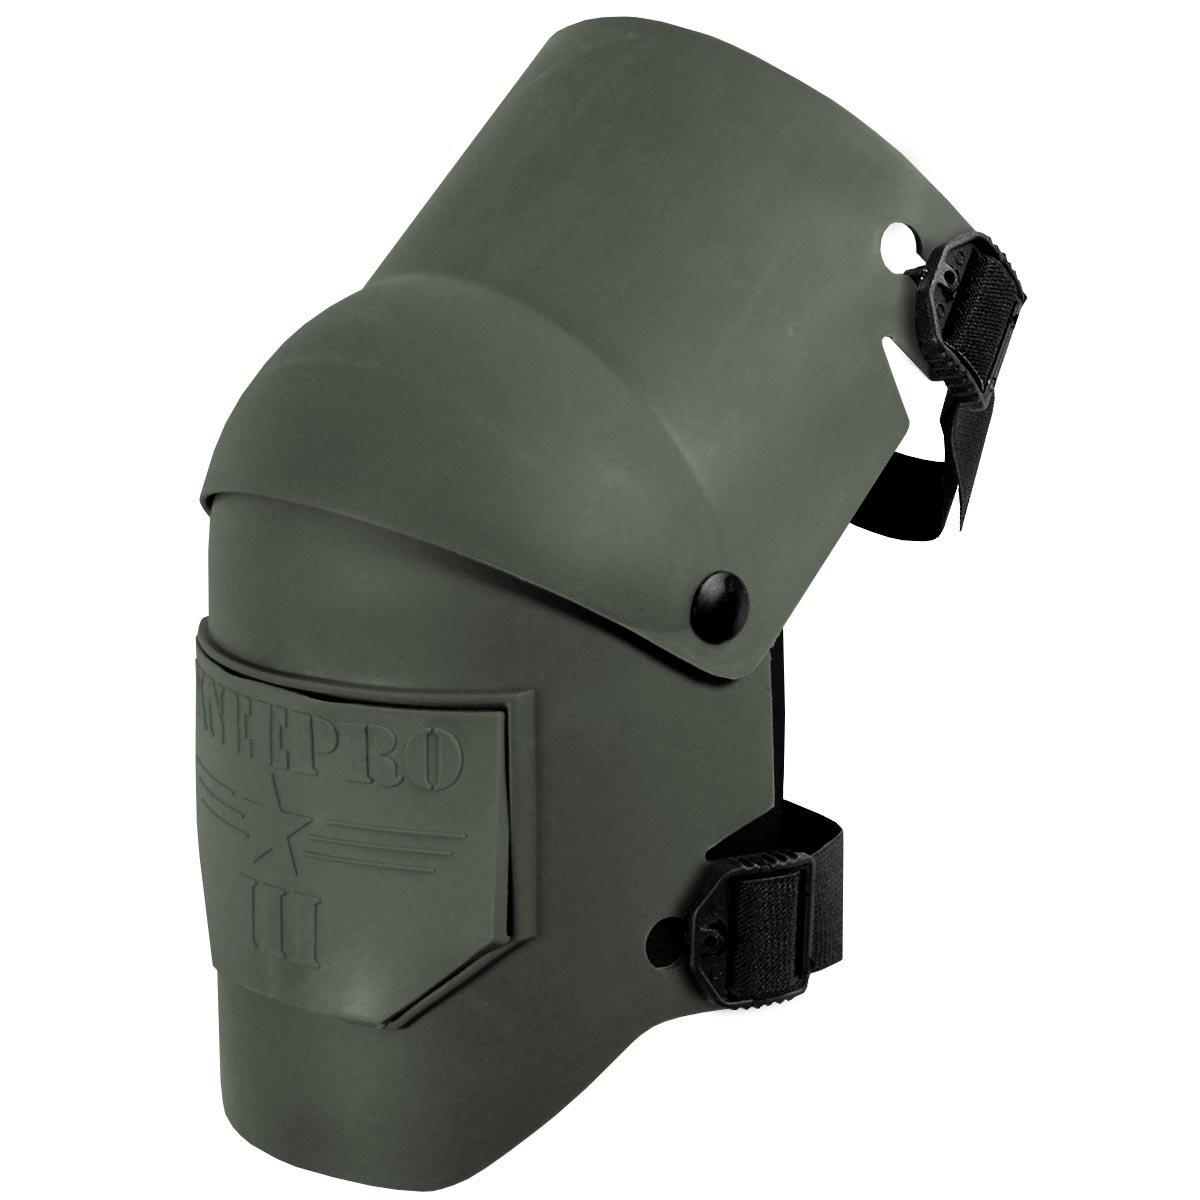 KP Industries Knee Pro Ultra Flex III Knee Pads (OD Green)